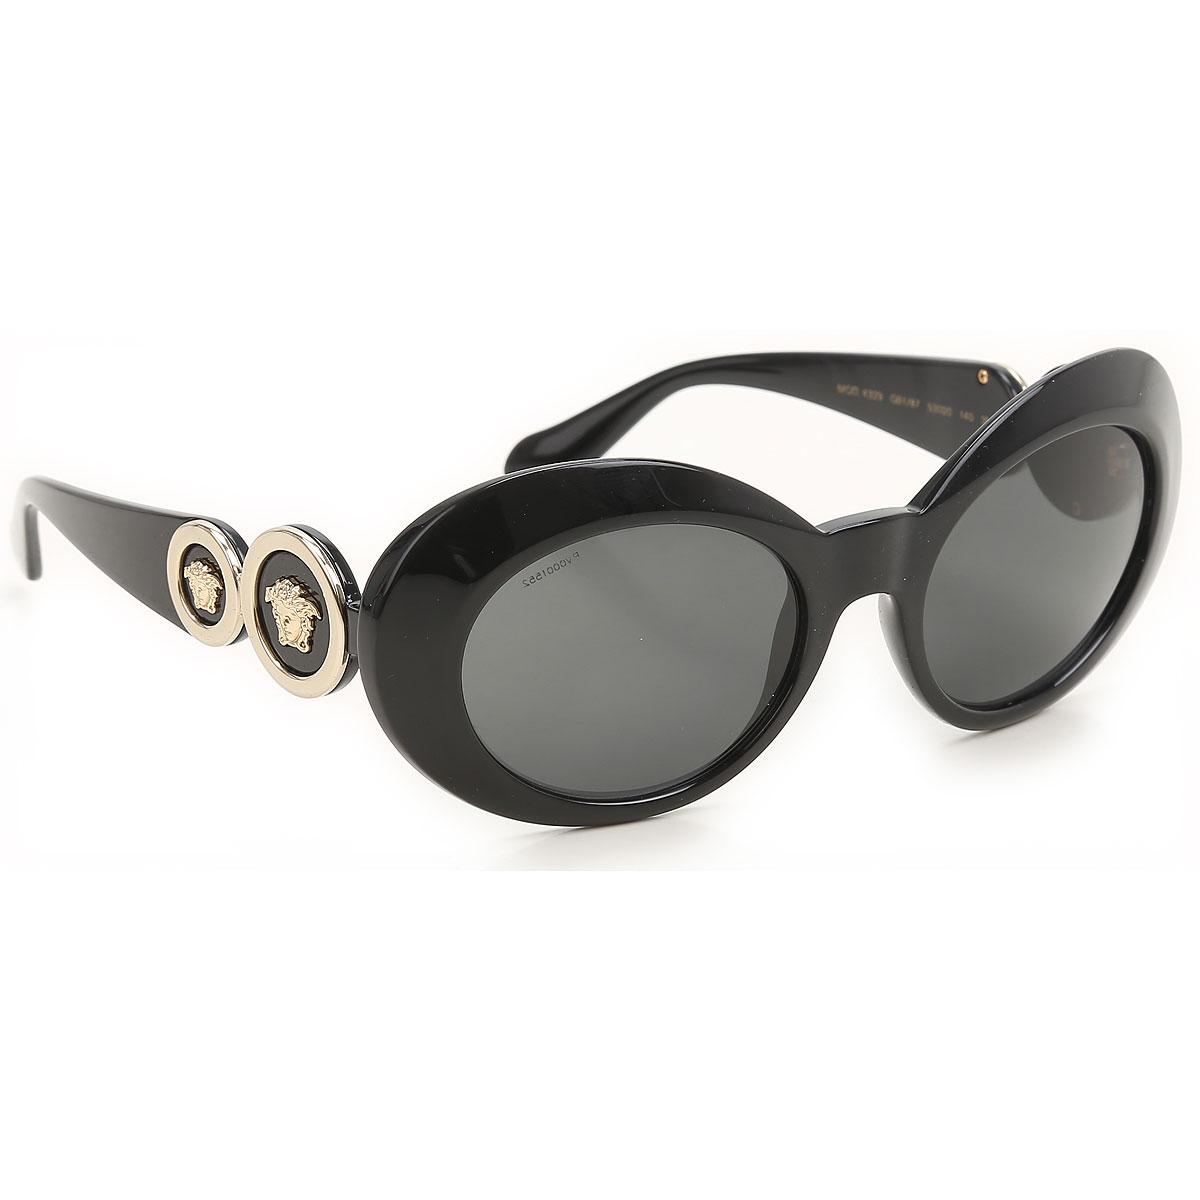 00db152674 ... Gafas y Lentes de Sol Gianni Versace. PANTALLA COMPLETA. 1) Presionar y  Girar Manualmente 2) Doble Clic para Girar Automaticamente